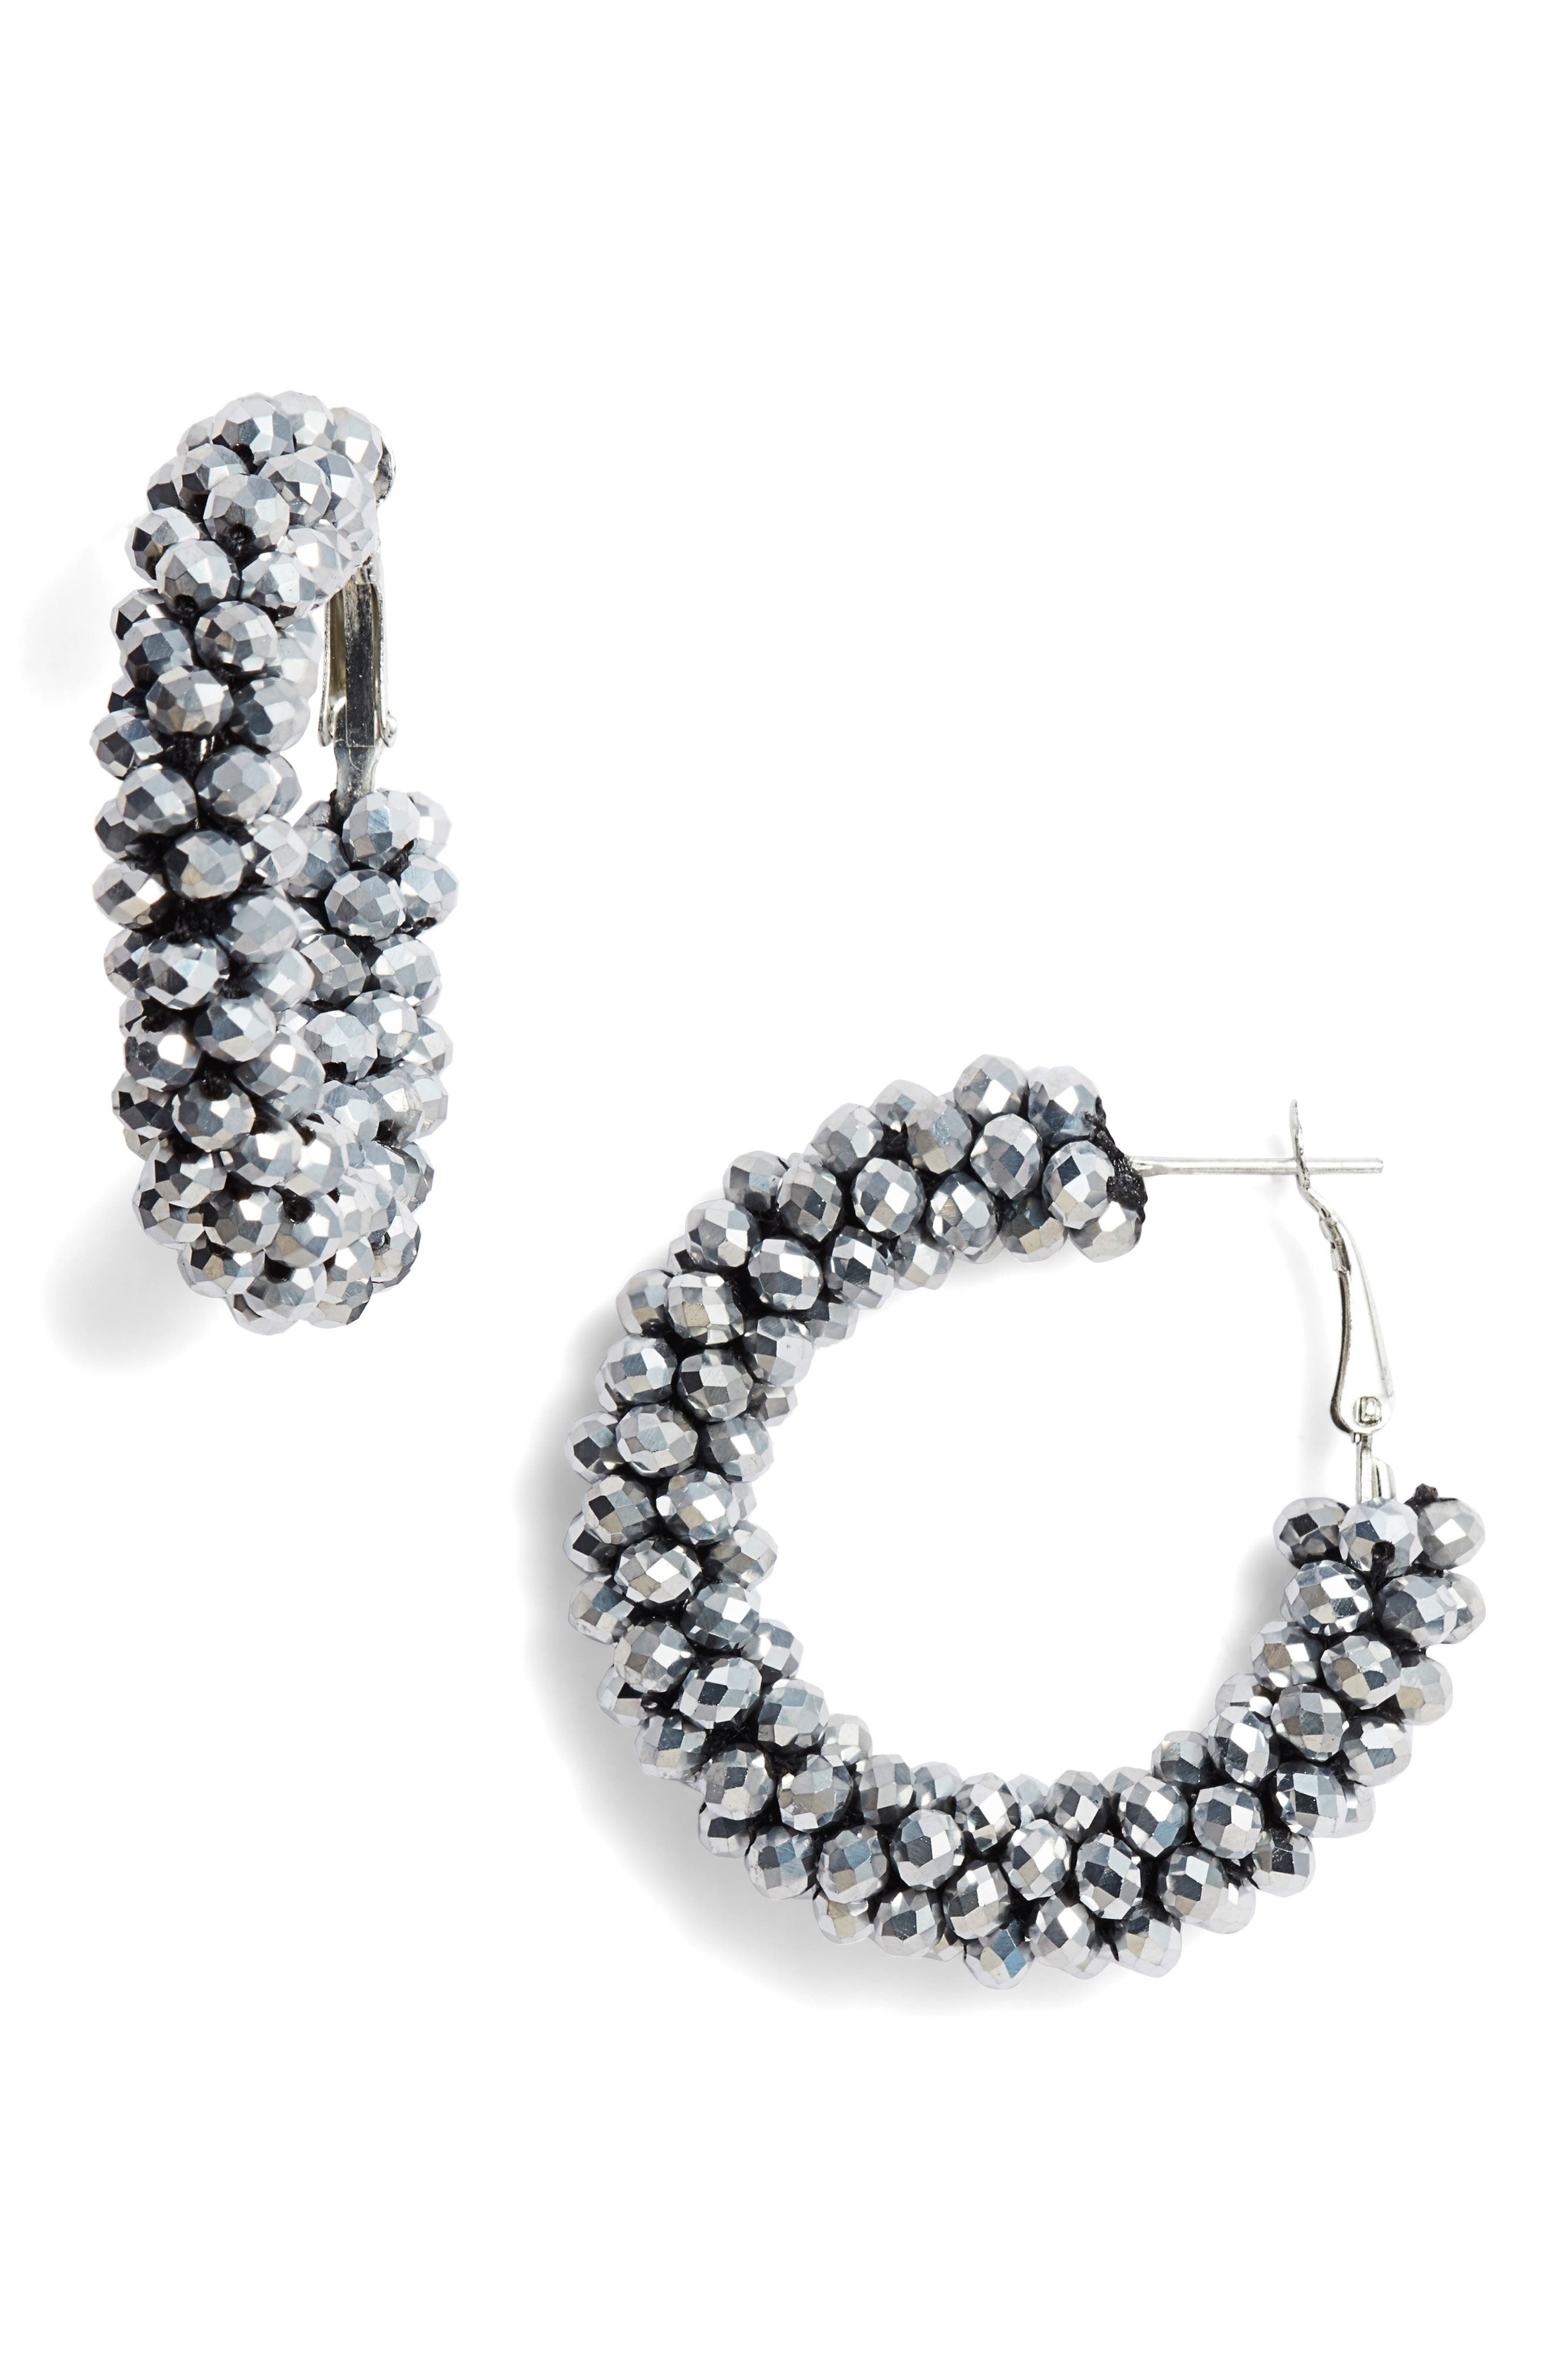 AREA STARS Beaded Hoop Earrings in Silver